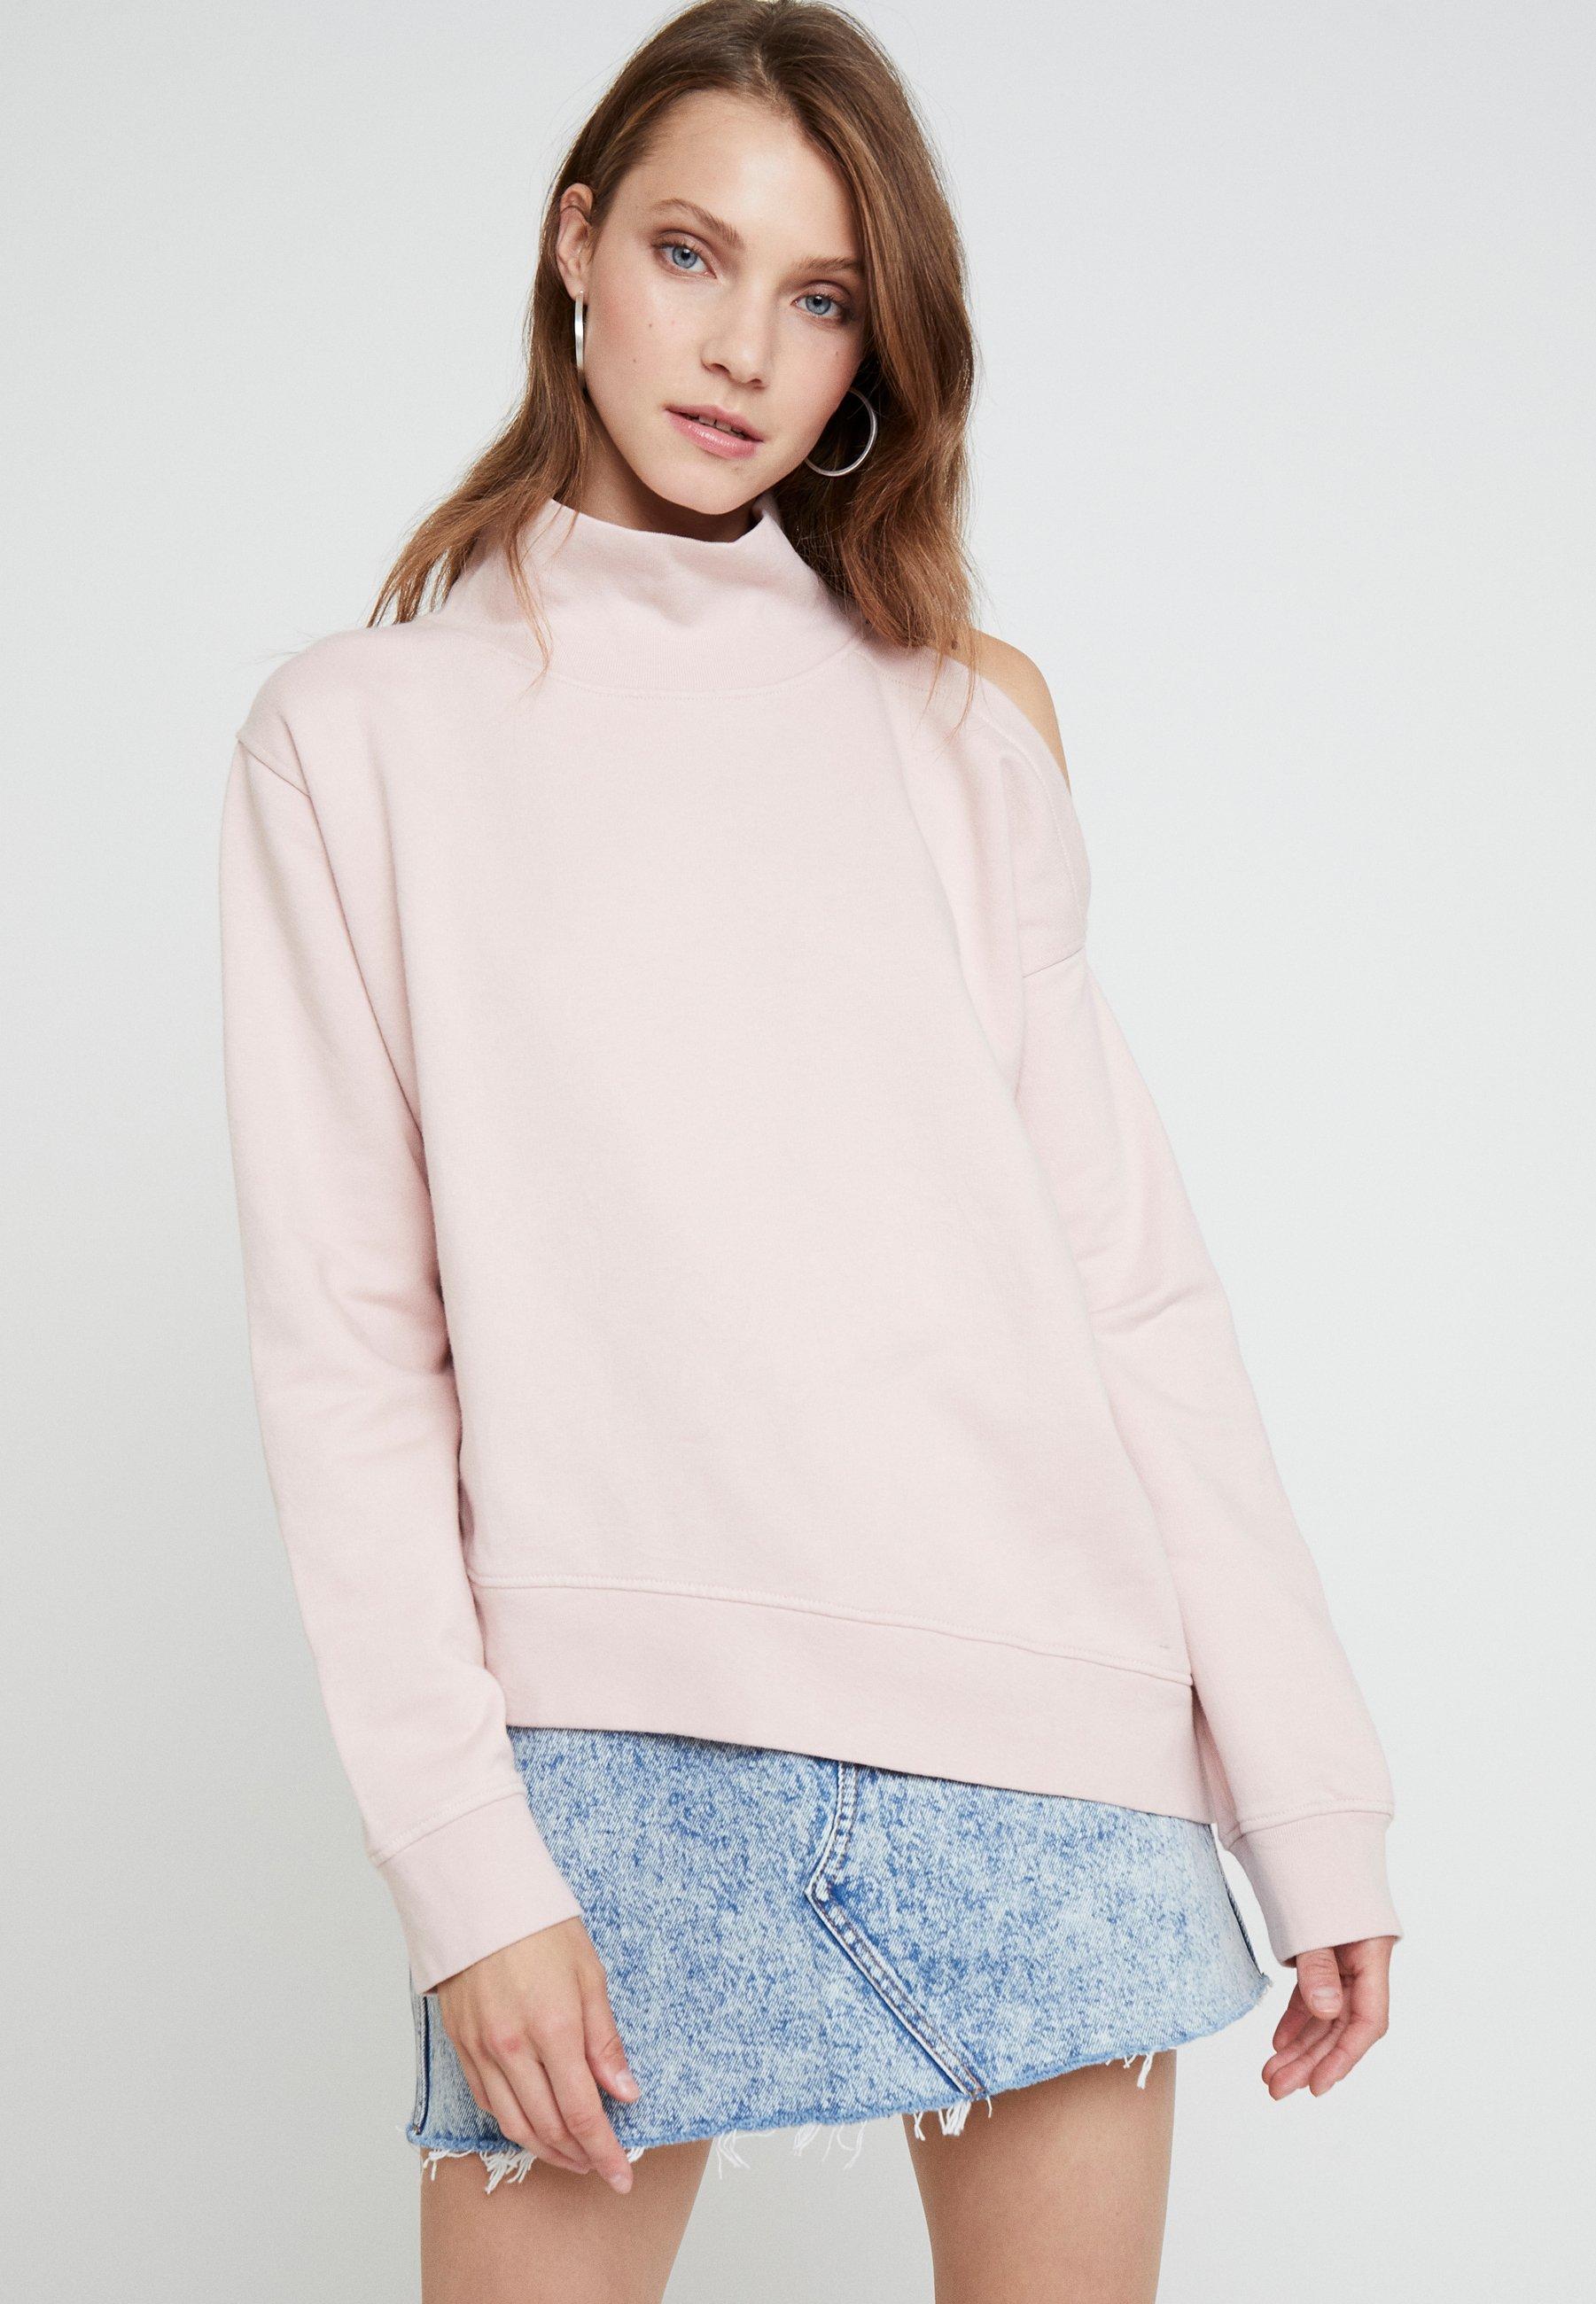 BradySweatshirt Allsaints BradySweatshirt Rose Allsaints Pink Rose Pink Rose Allsaints BradySweatshirt mNn80PywOv